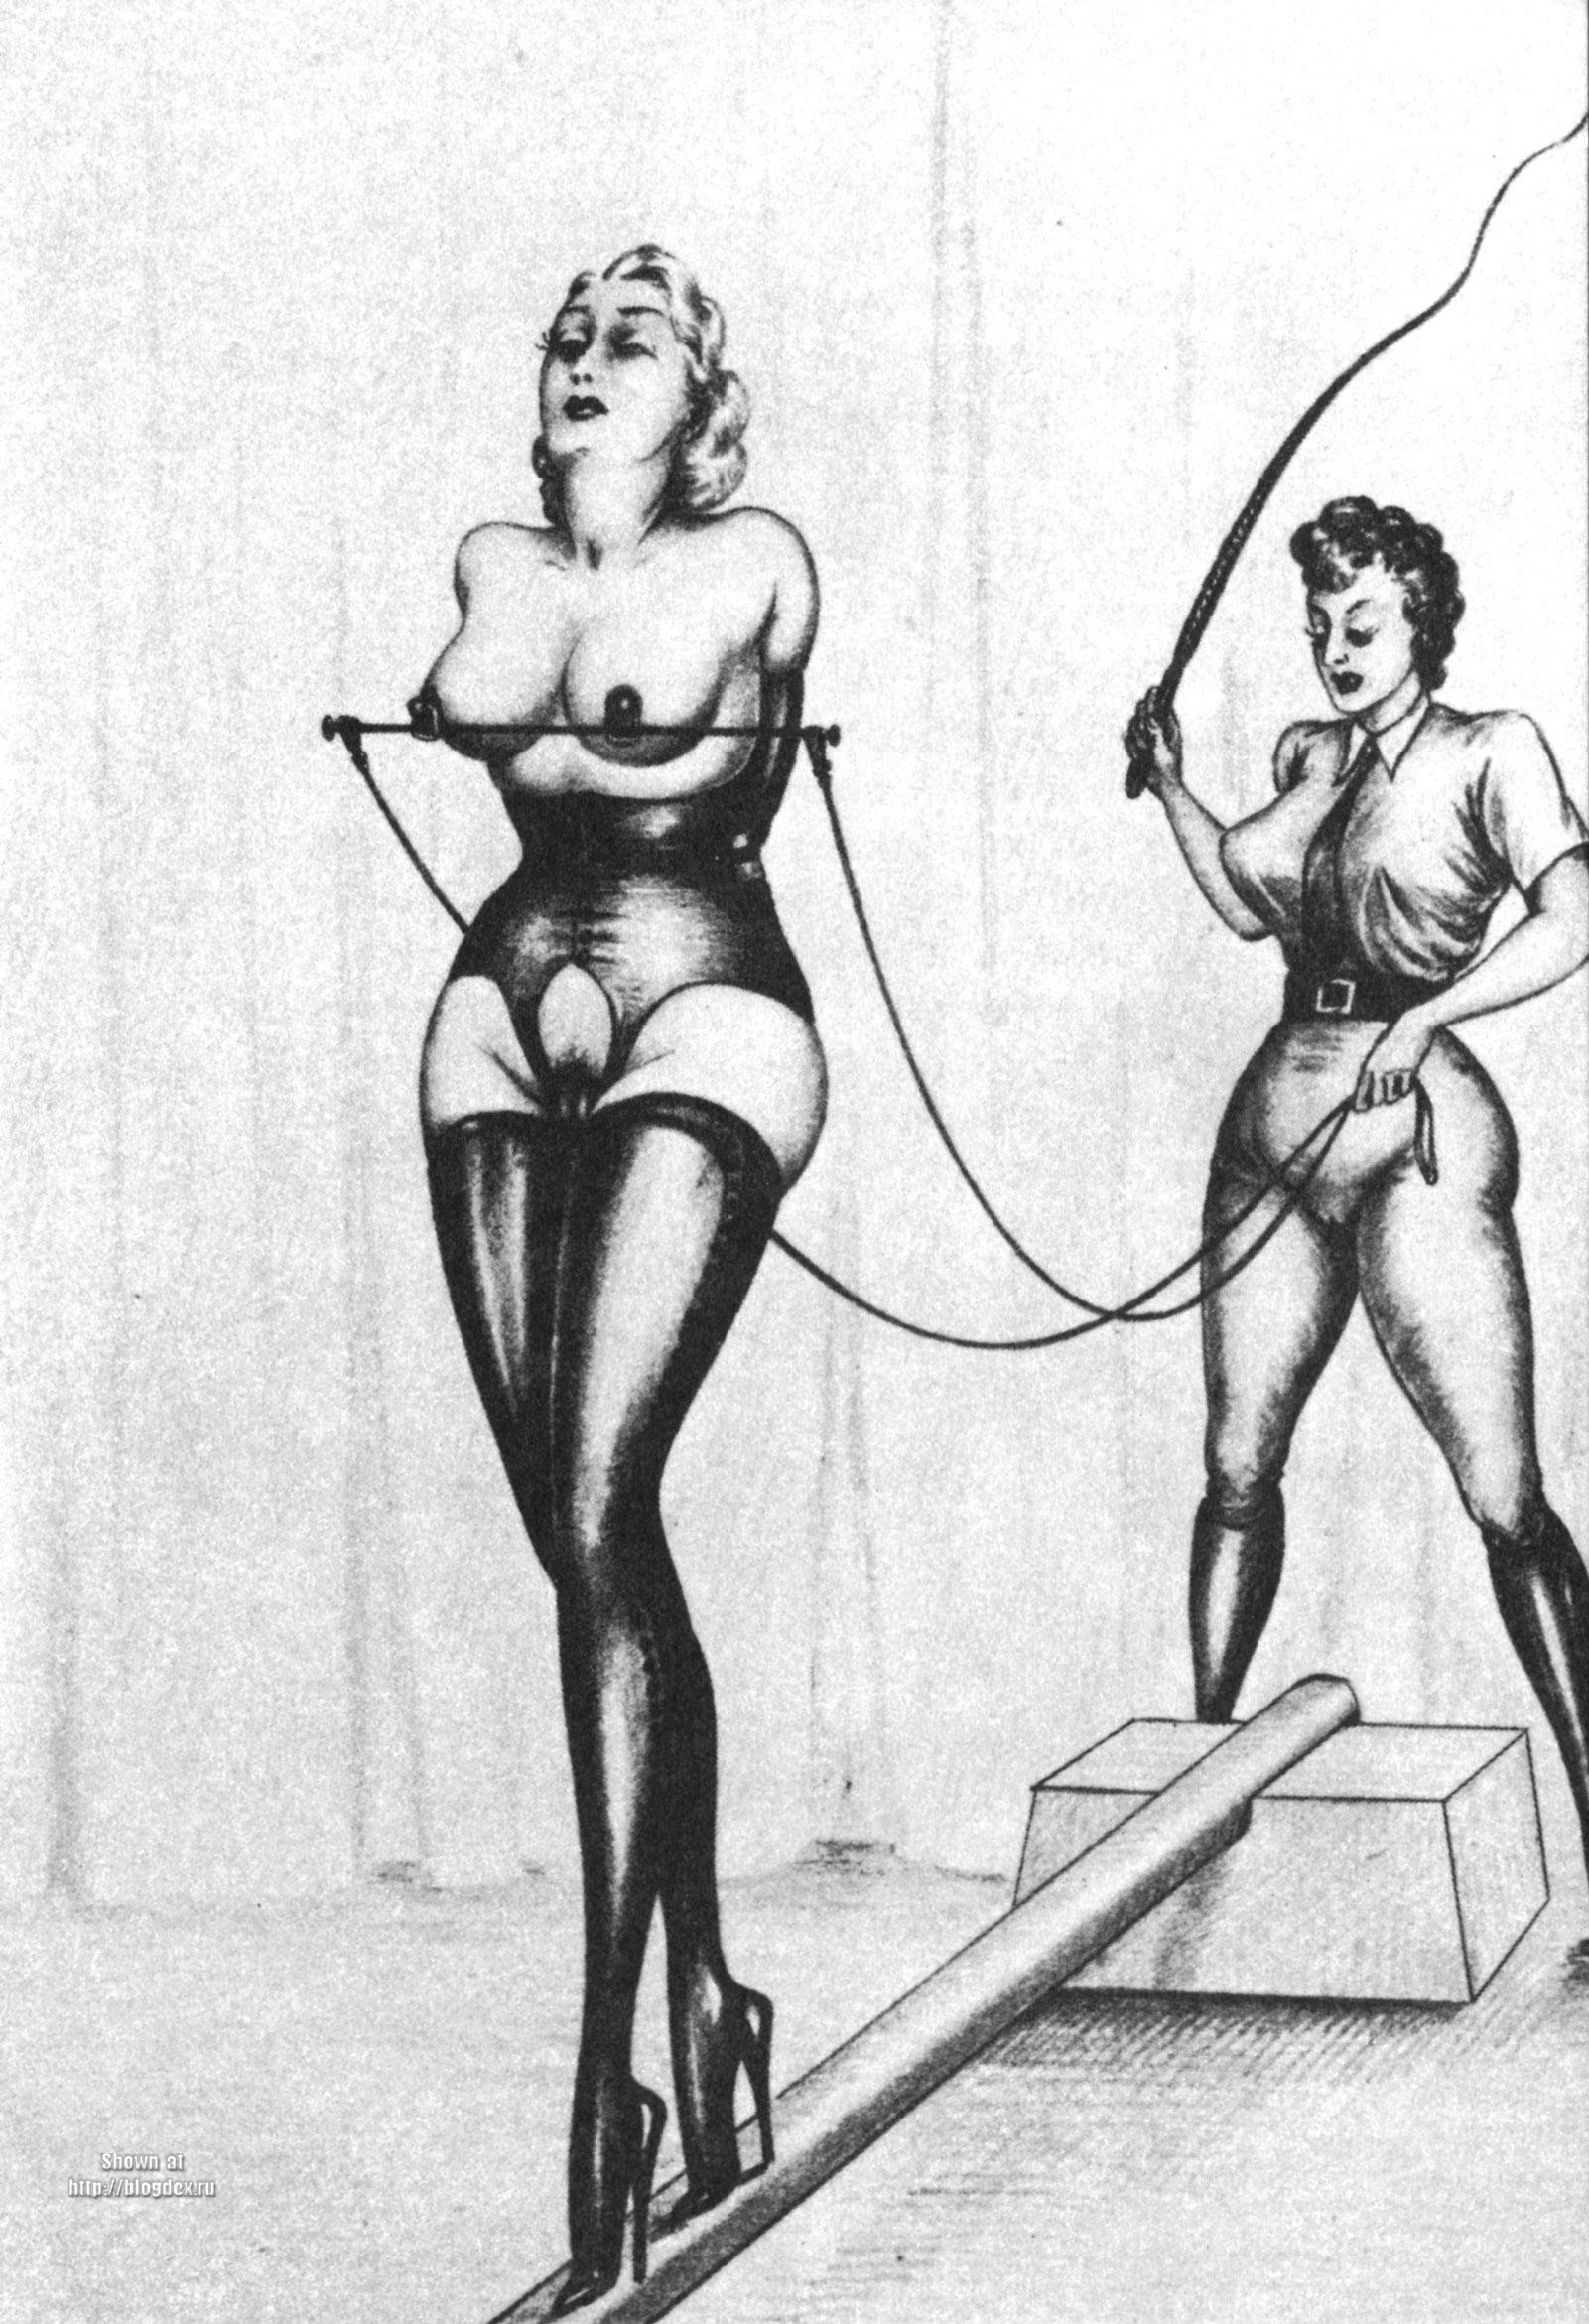 Erotic art cuckold